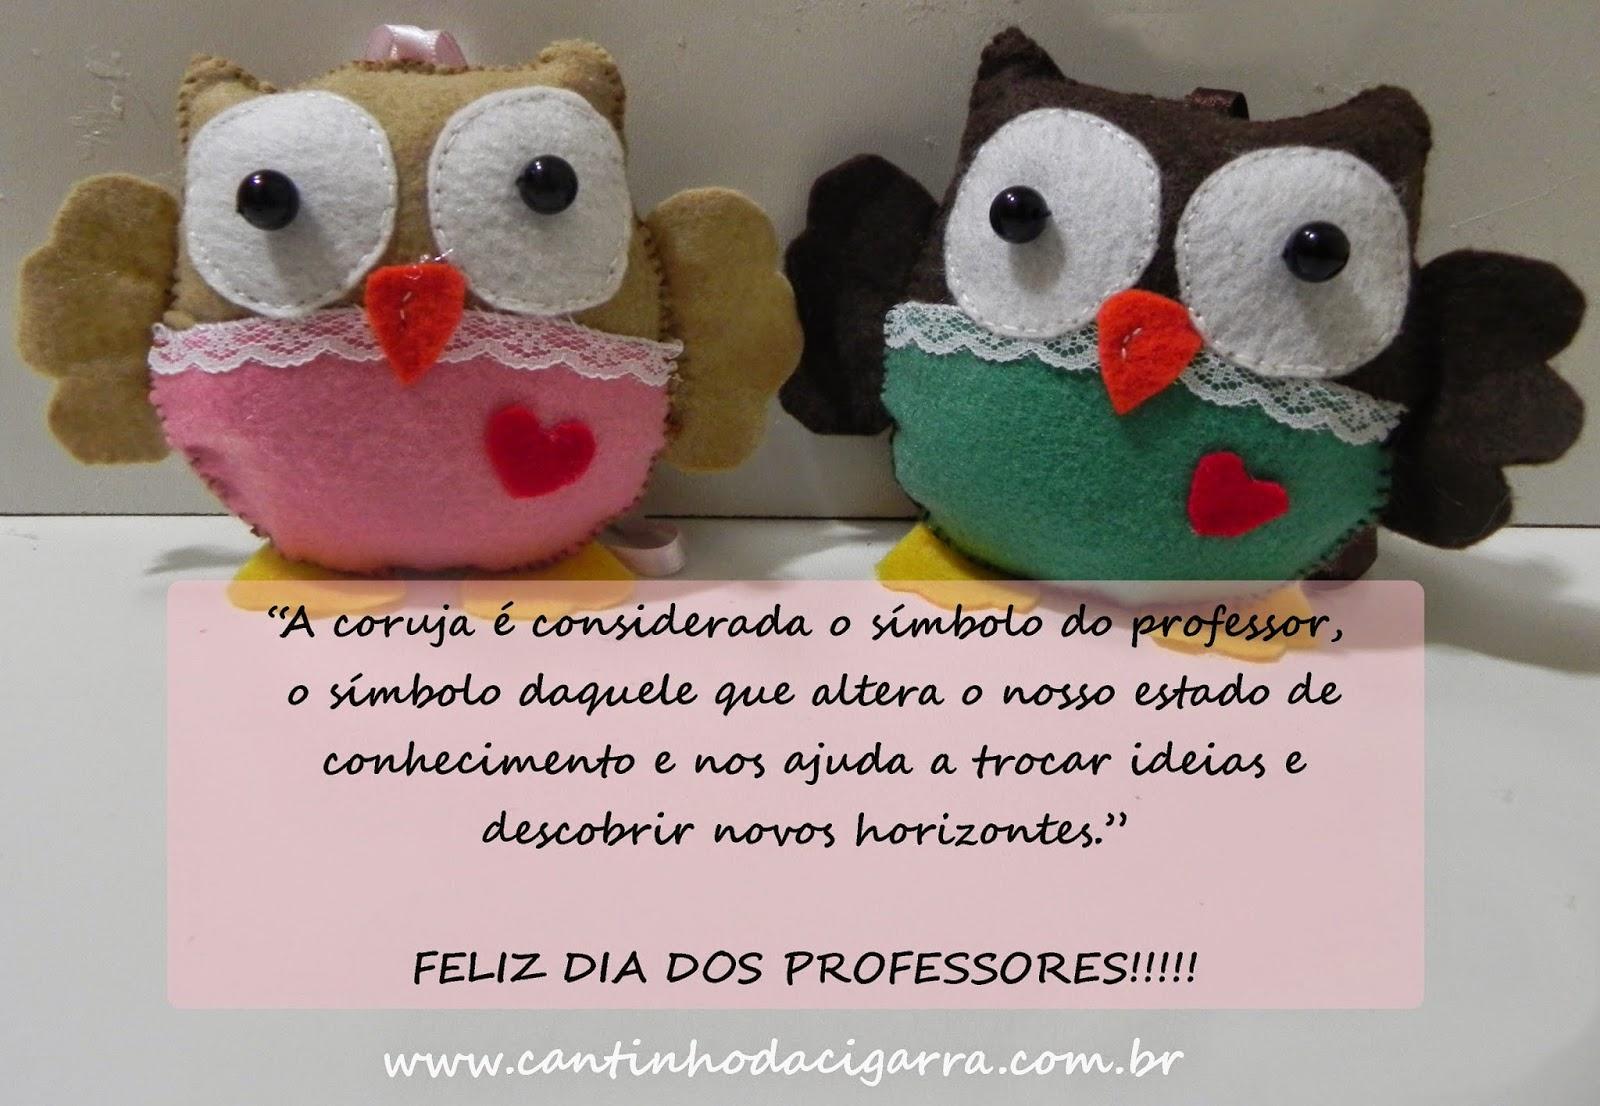 http://www.cantinhodacigarra.com.br